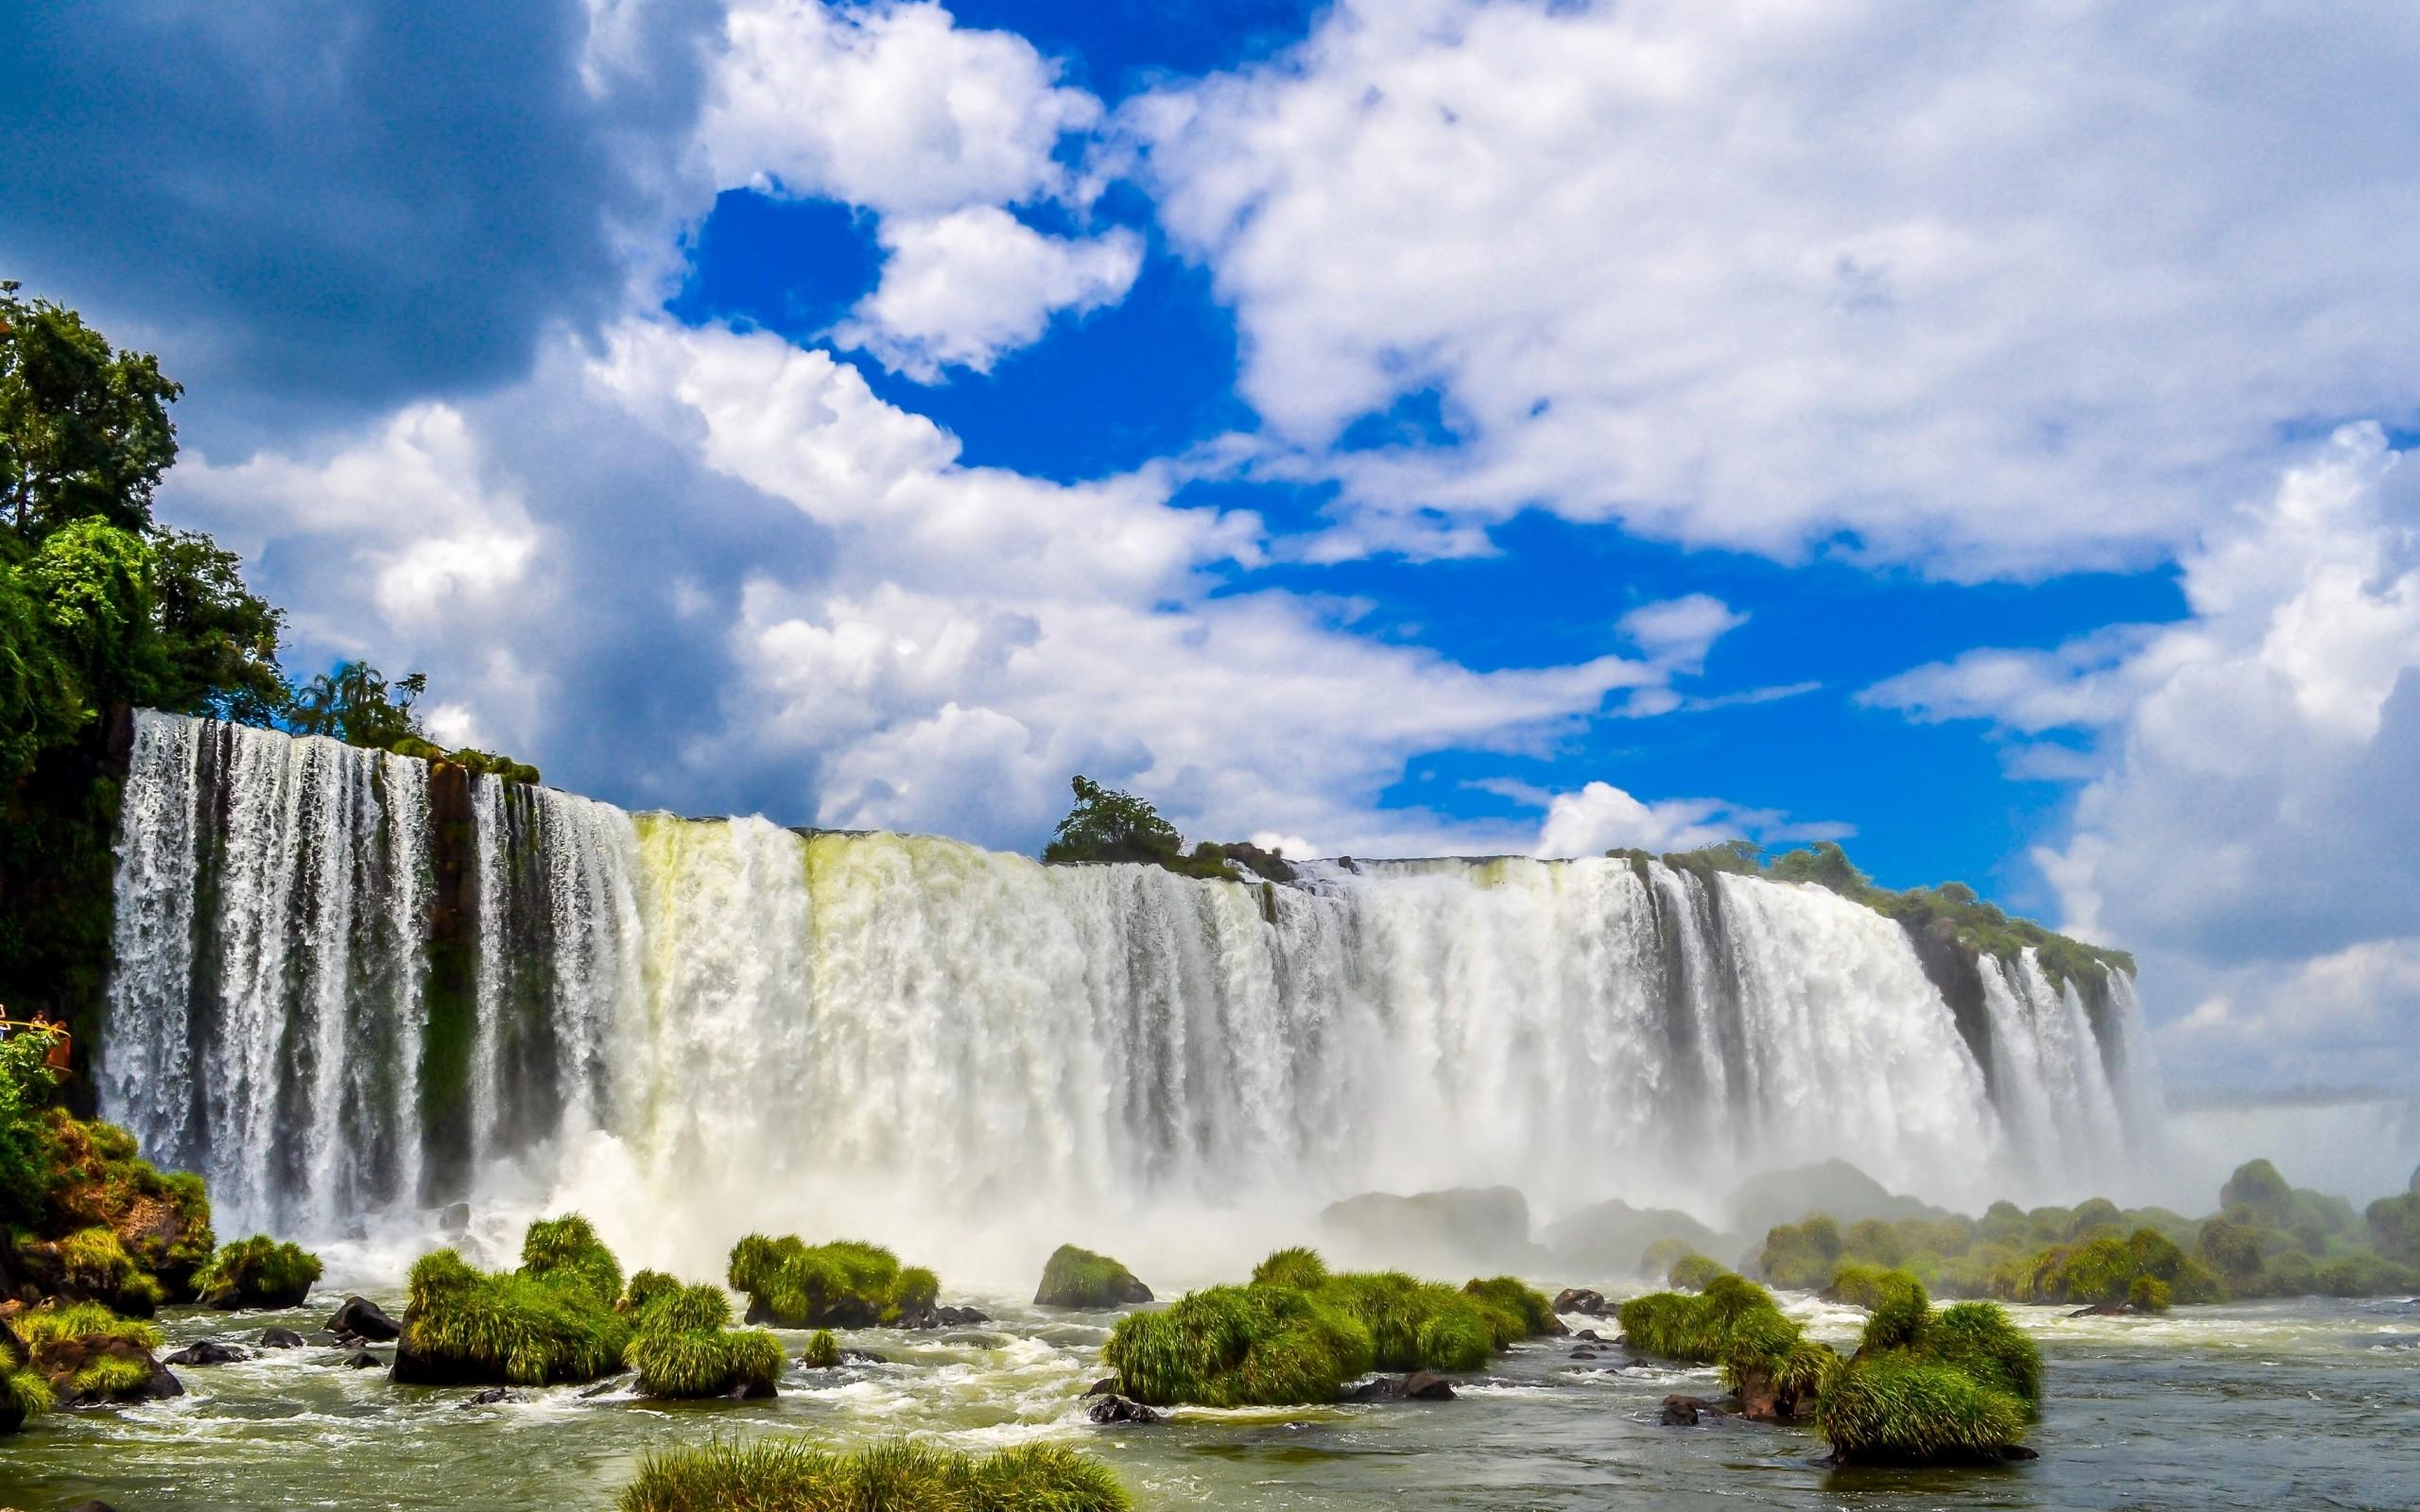 Iguazu Falls Iphone Wallpaper Iguazu Falls In Brazil Hd Wallpaper Background Image